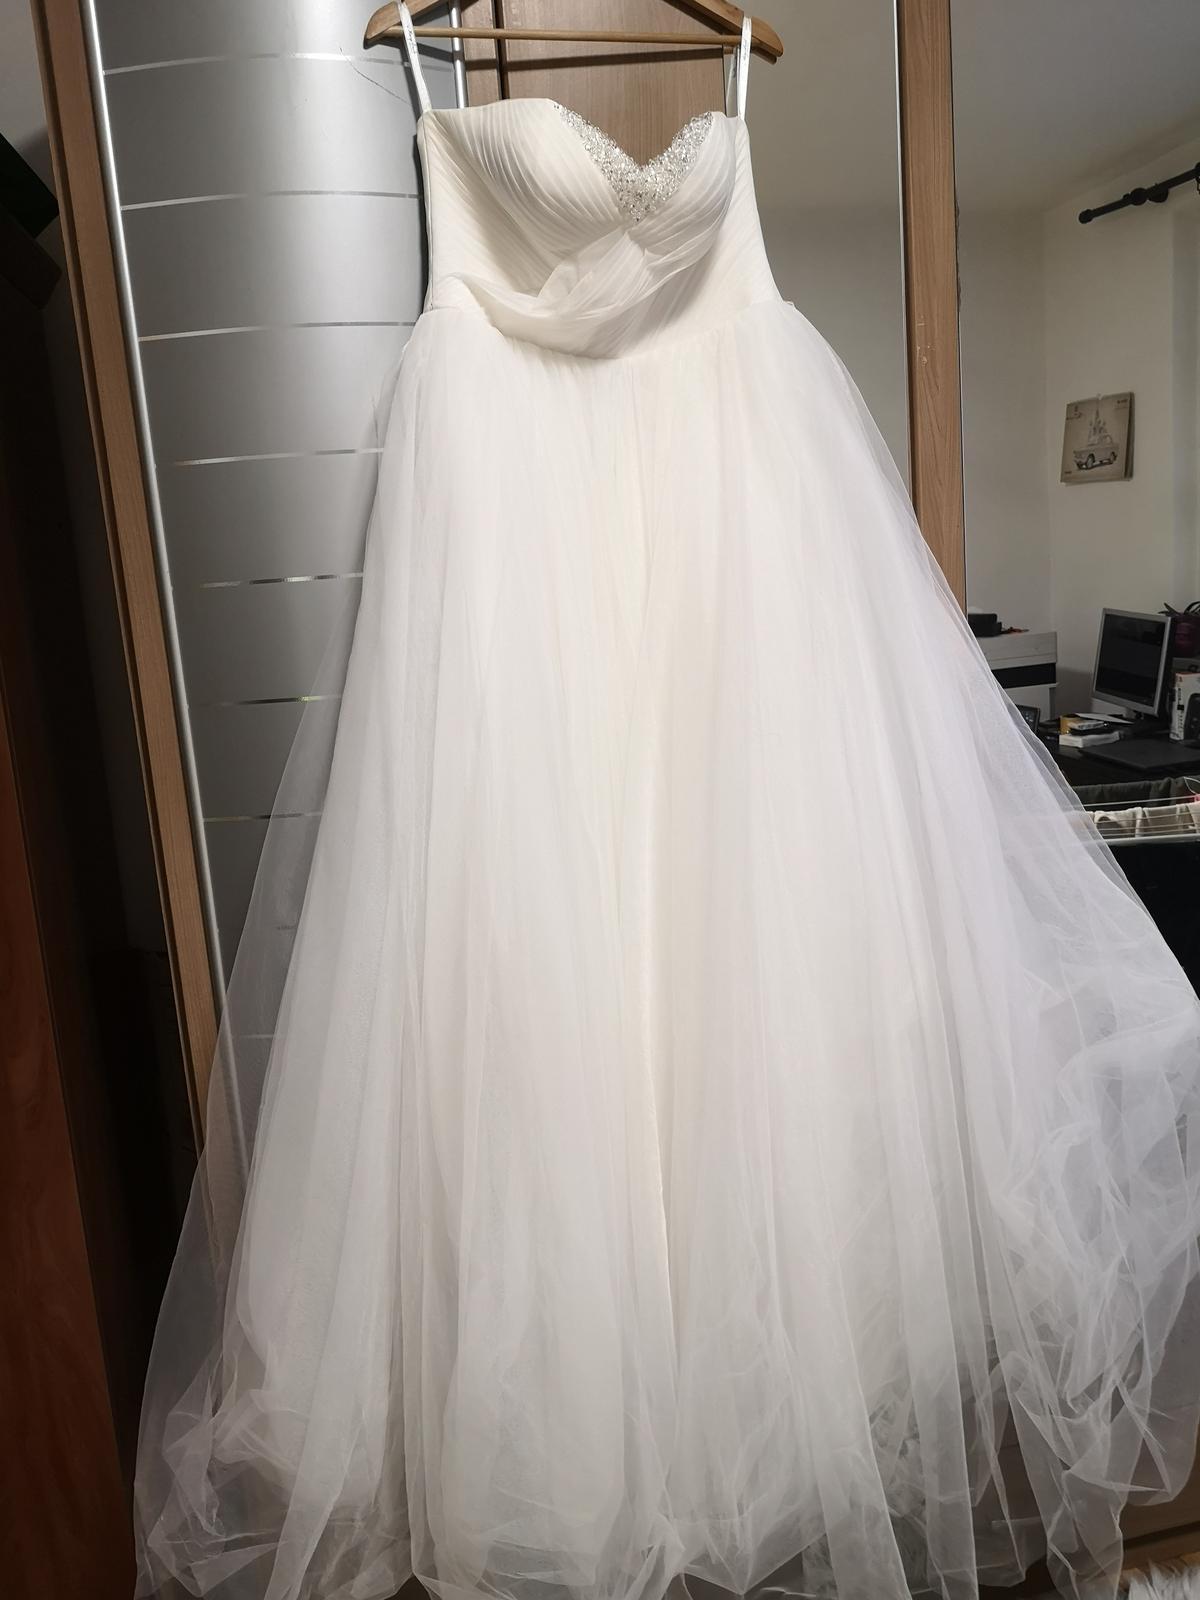 Korzetove svadobné šaty - Obrázok č. 3